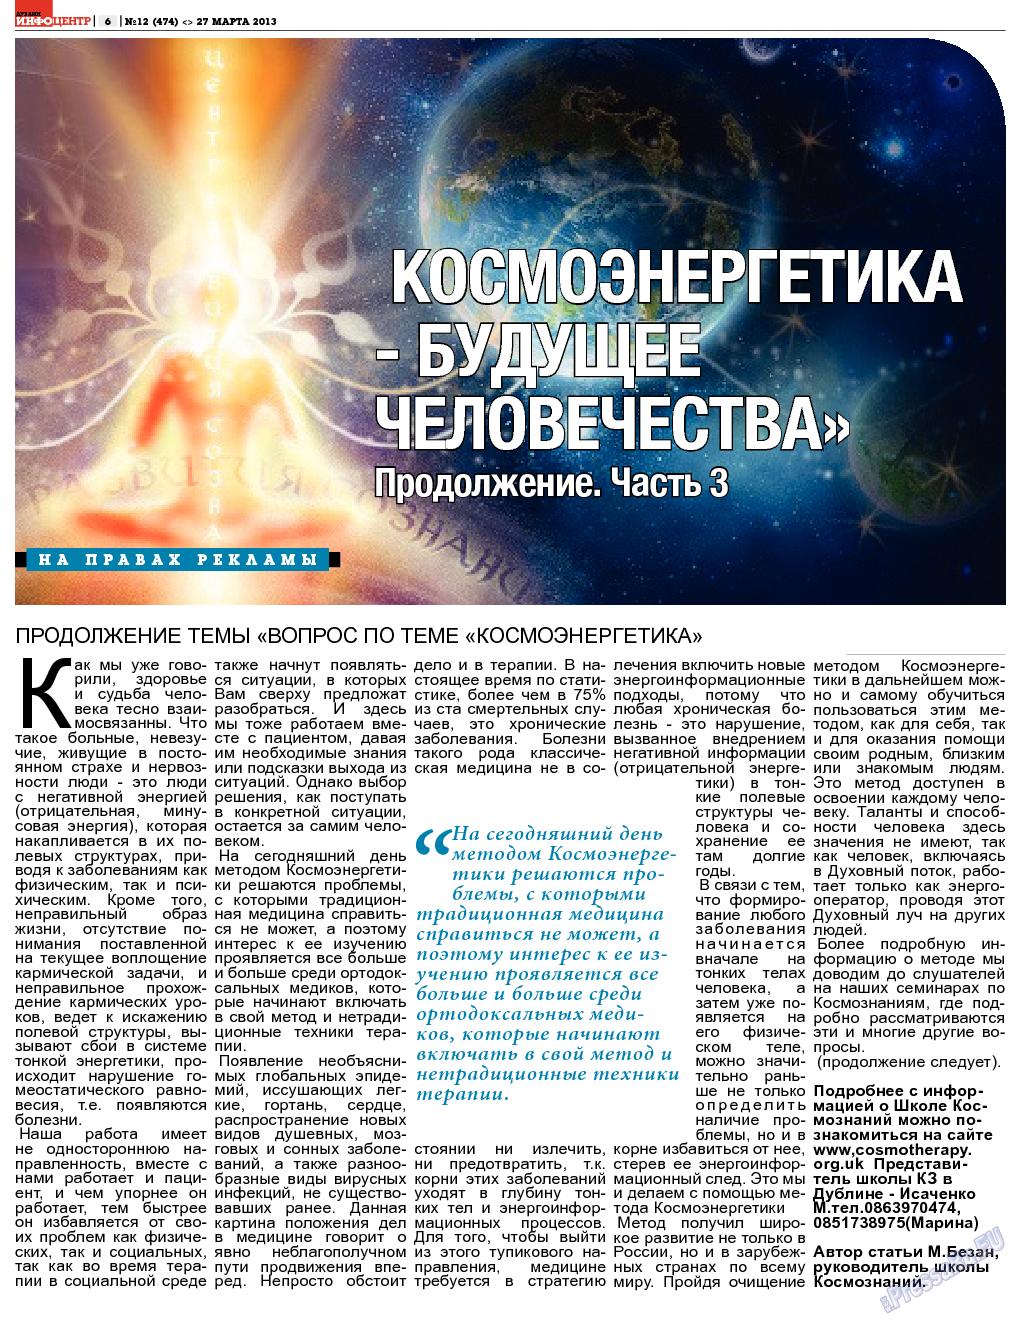 Дублин инфоцентр (газета). 2013 год, номер 12, стр. 6